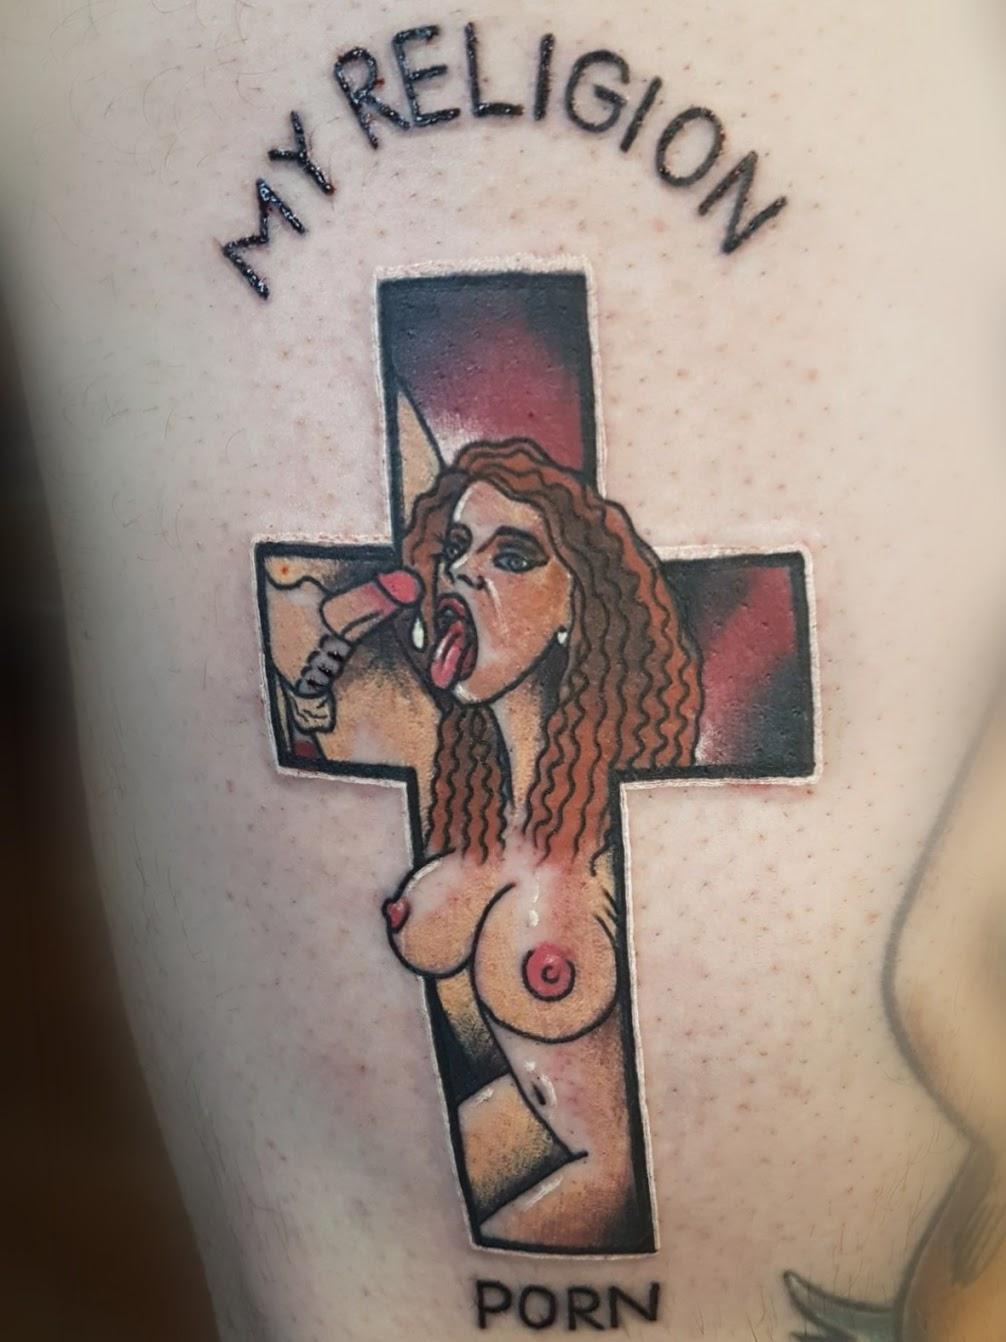 Tattoo-My-Religion